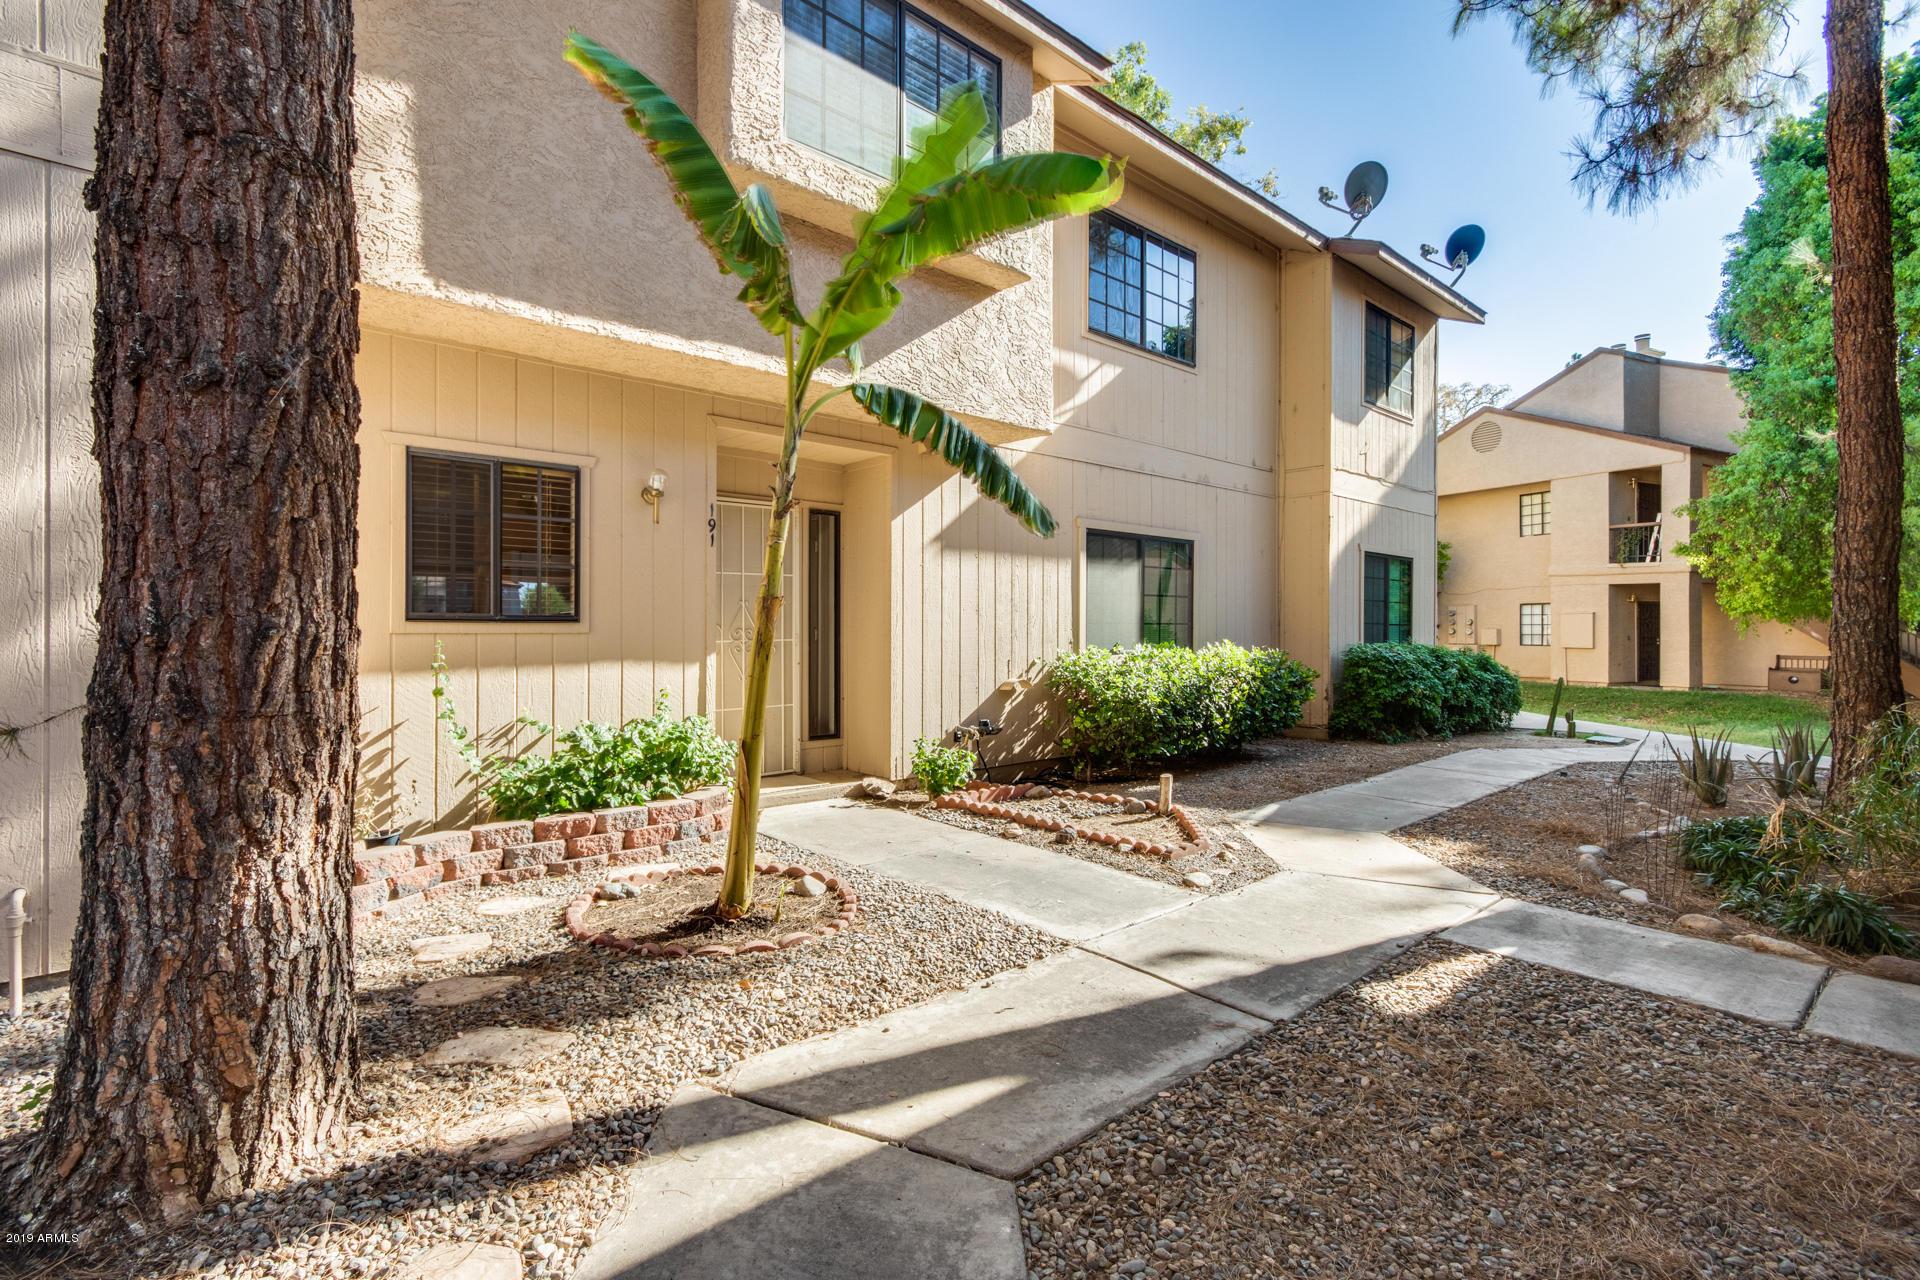 Photo of 6550 N 47TH Avenue #191, Glendale, AZ 85301